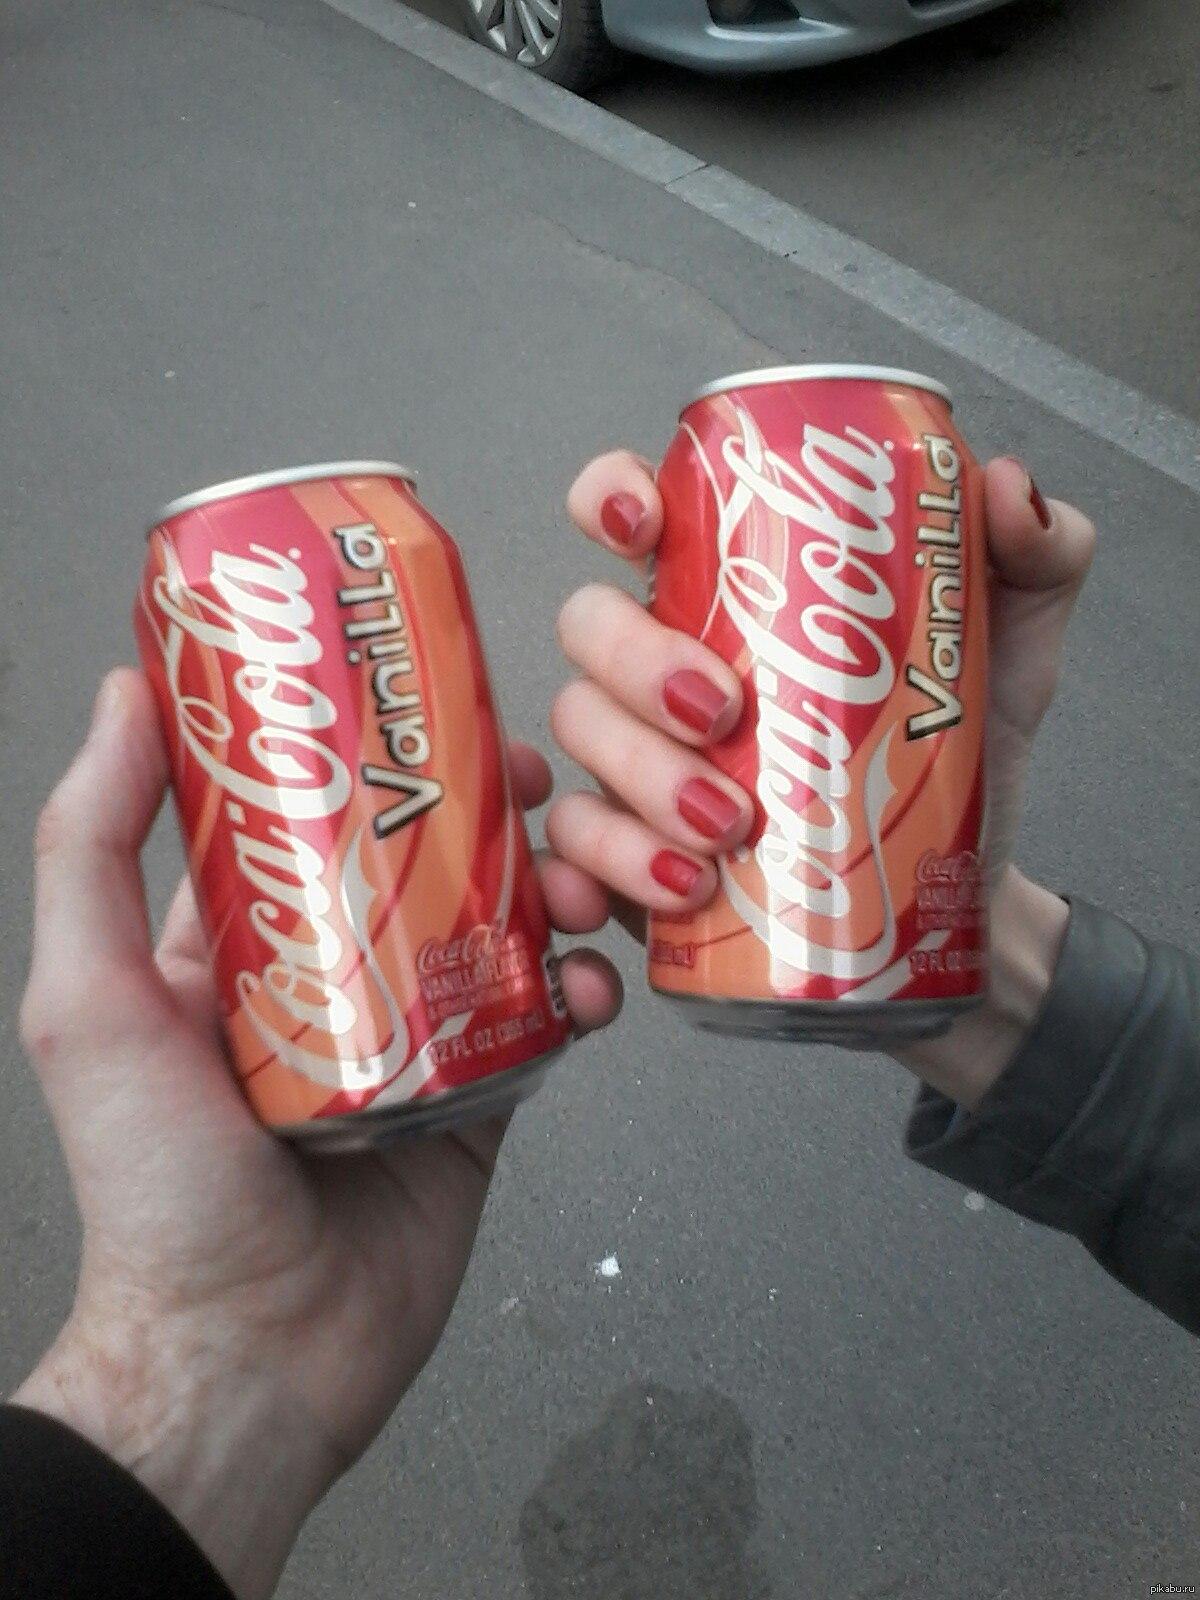 Кока-кола картинки в руке